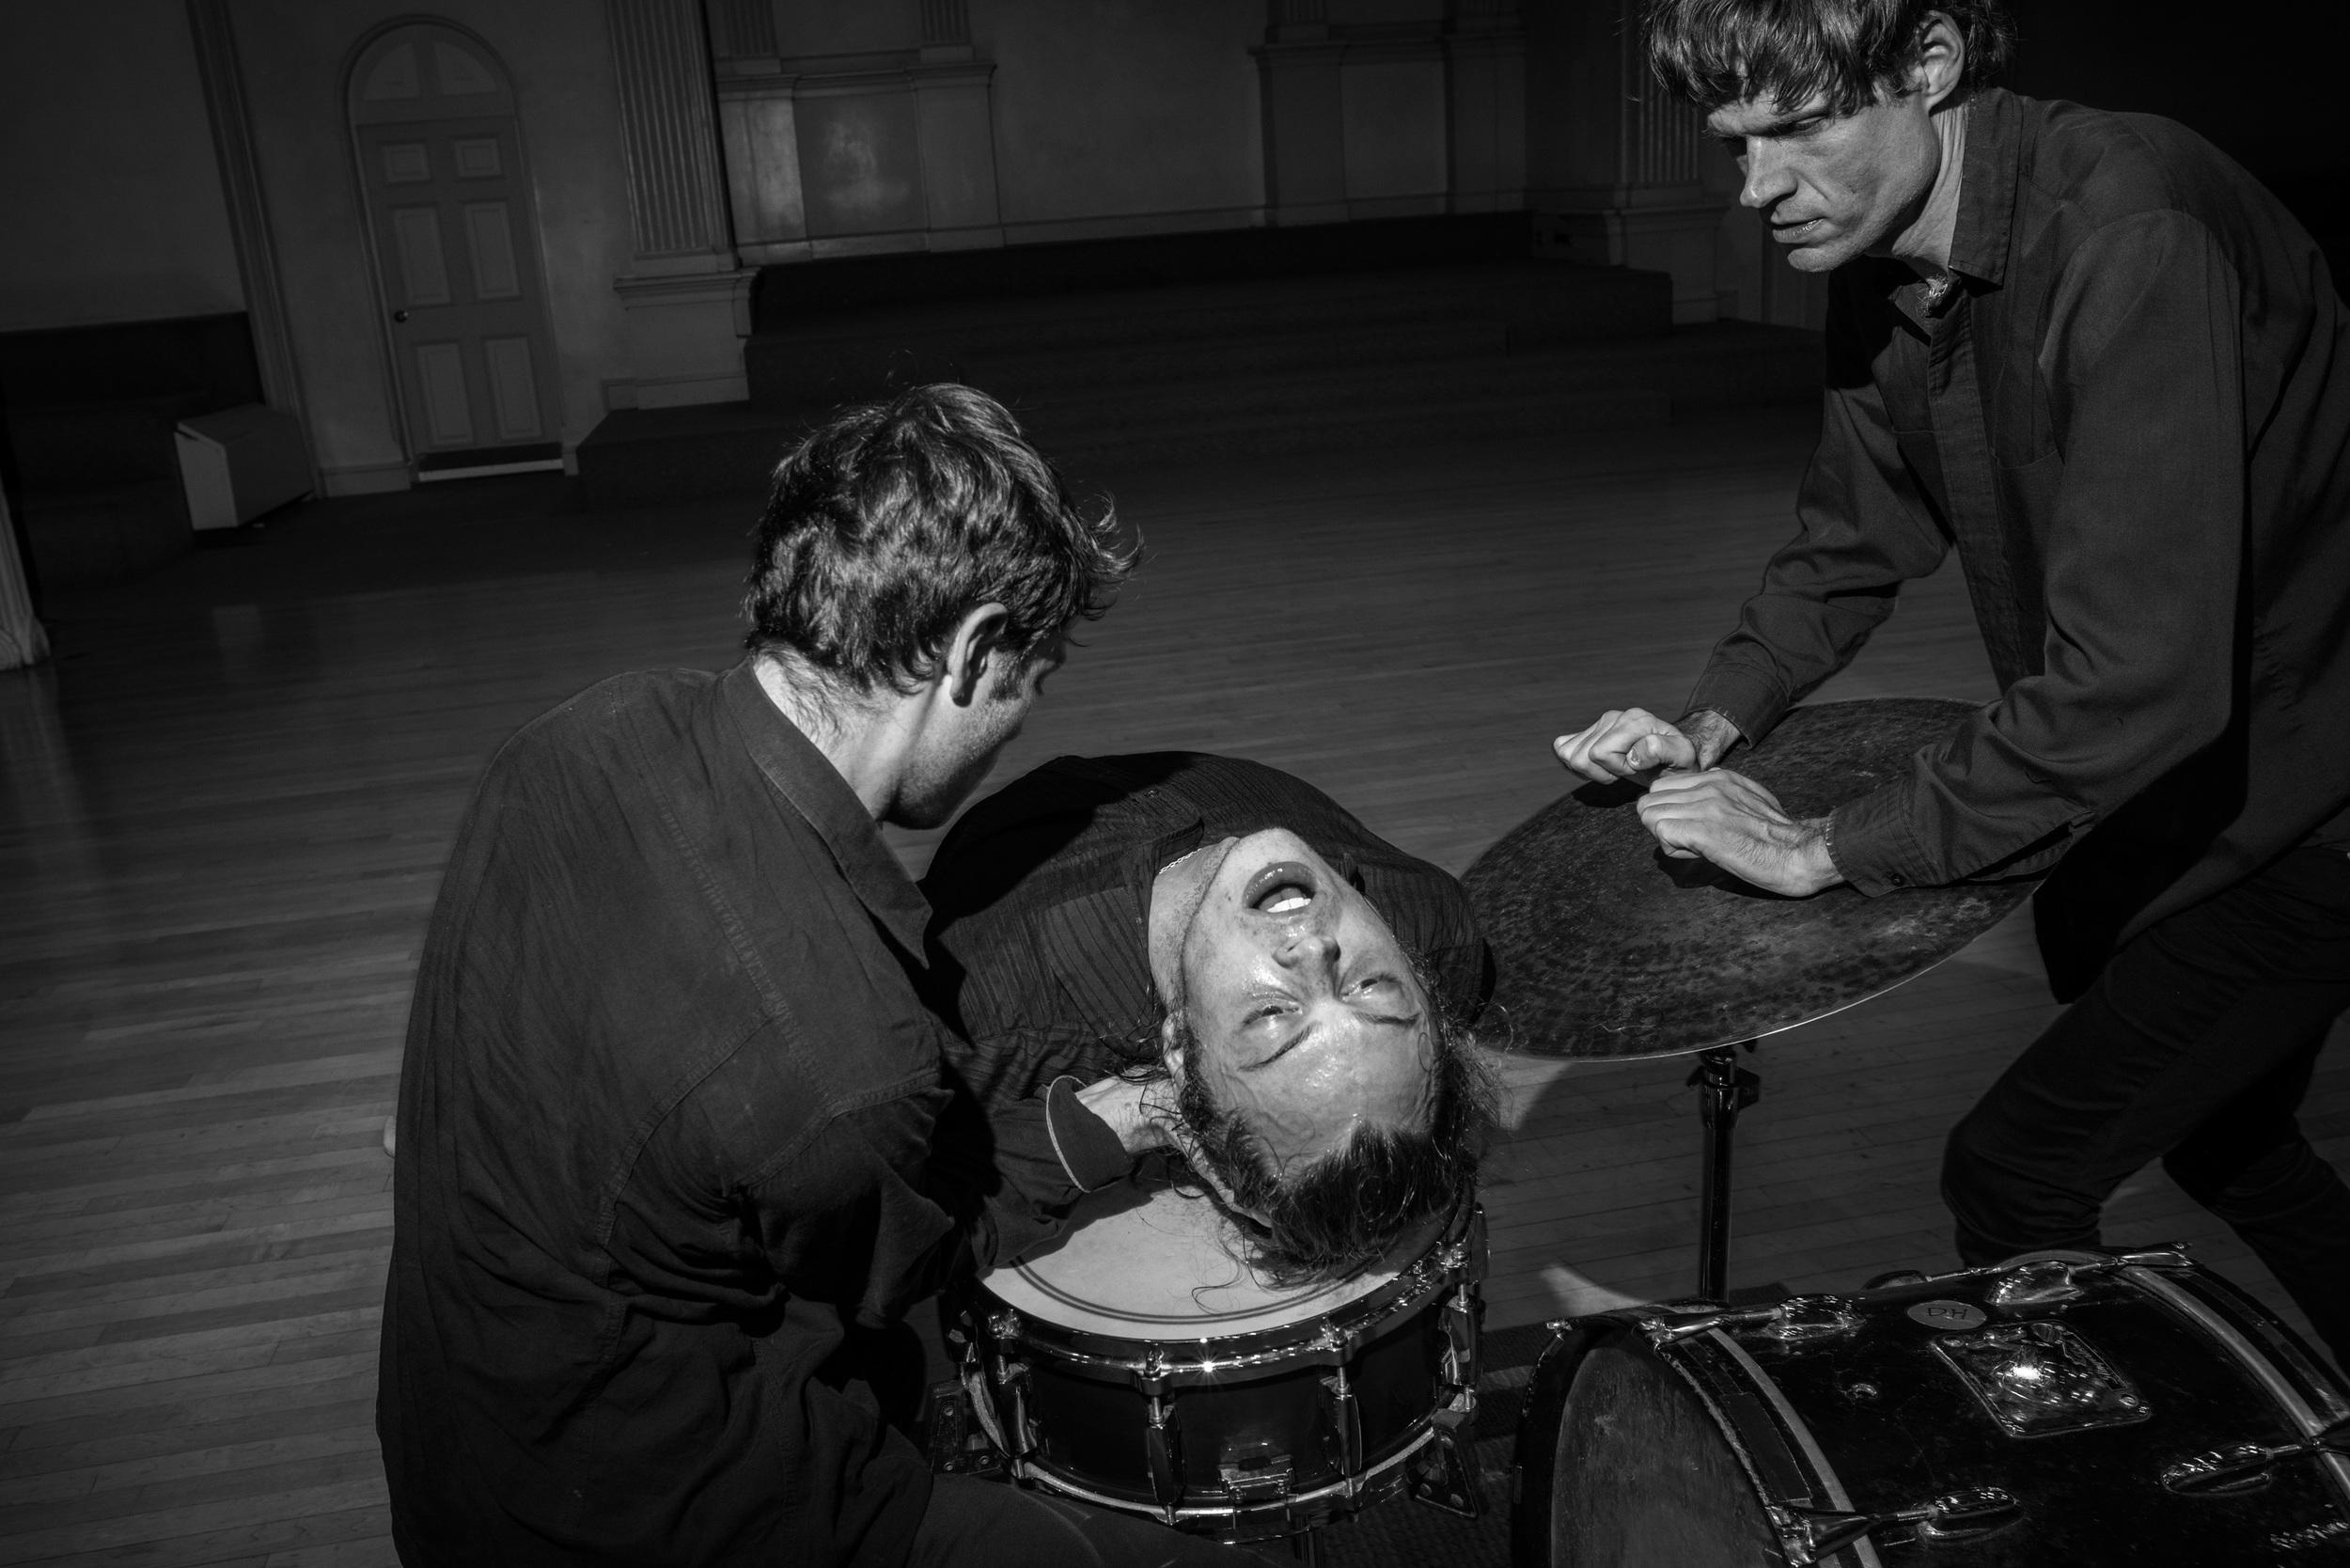 Repercussion Photograph by Jonno Rattman